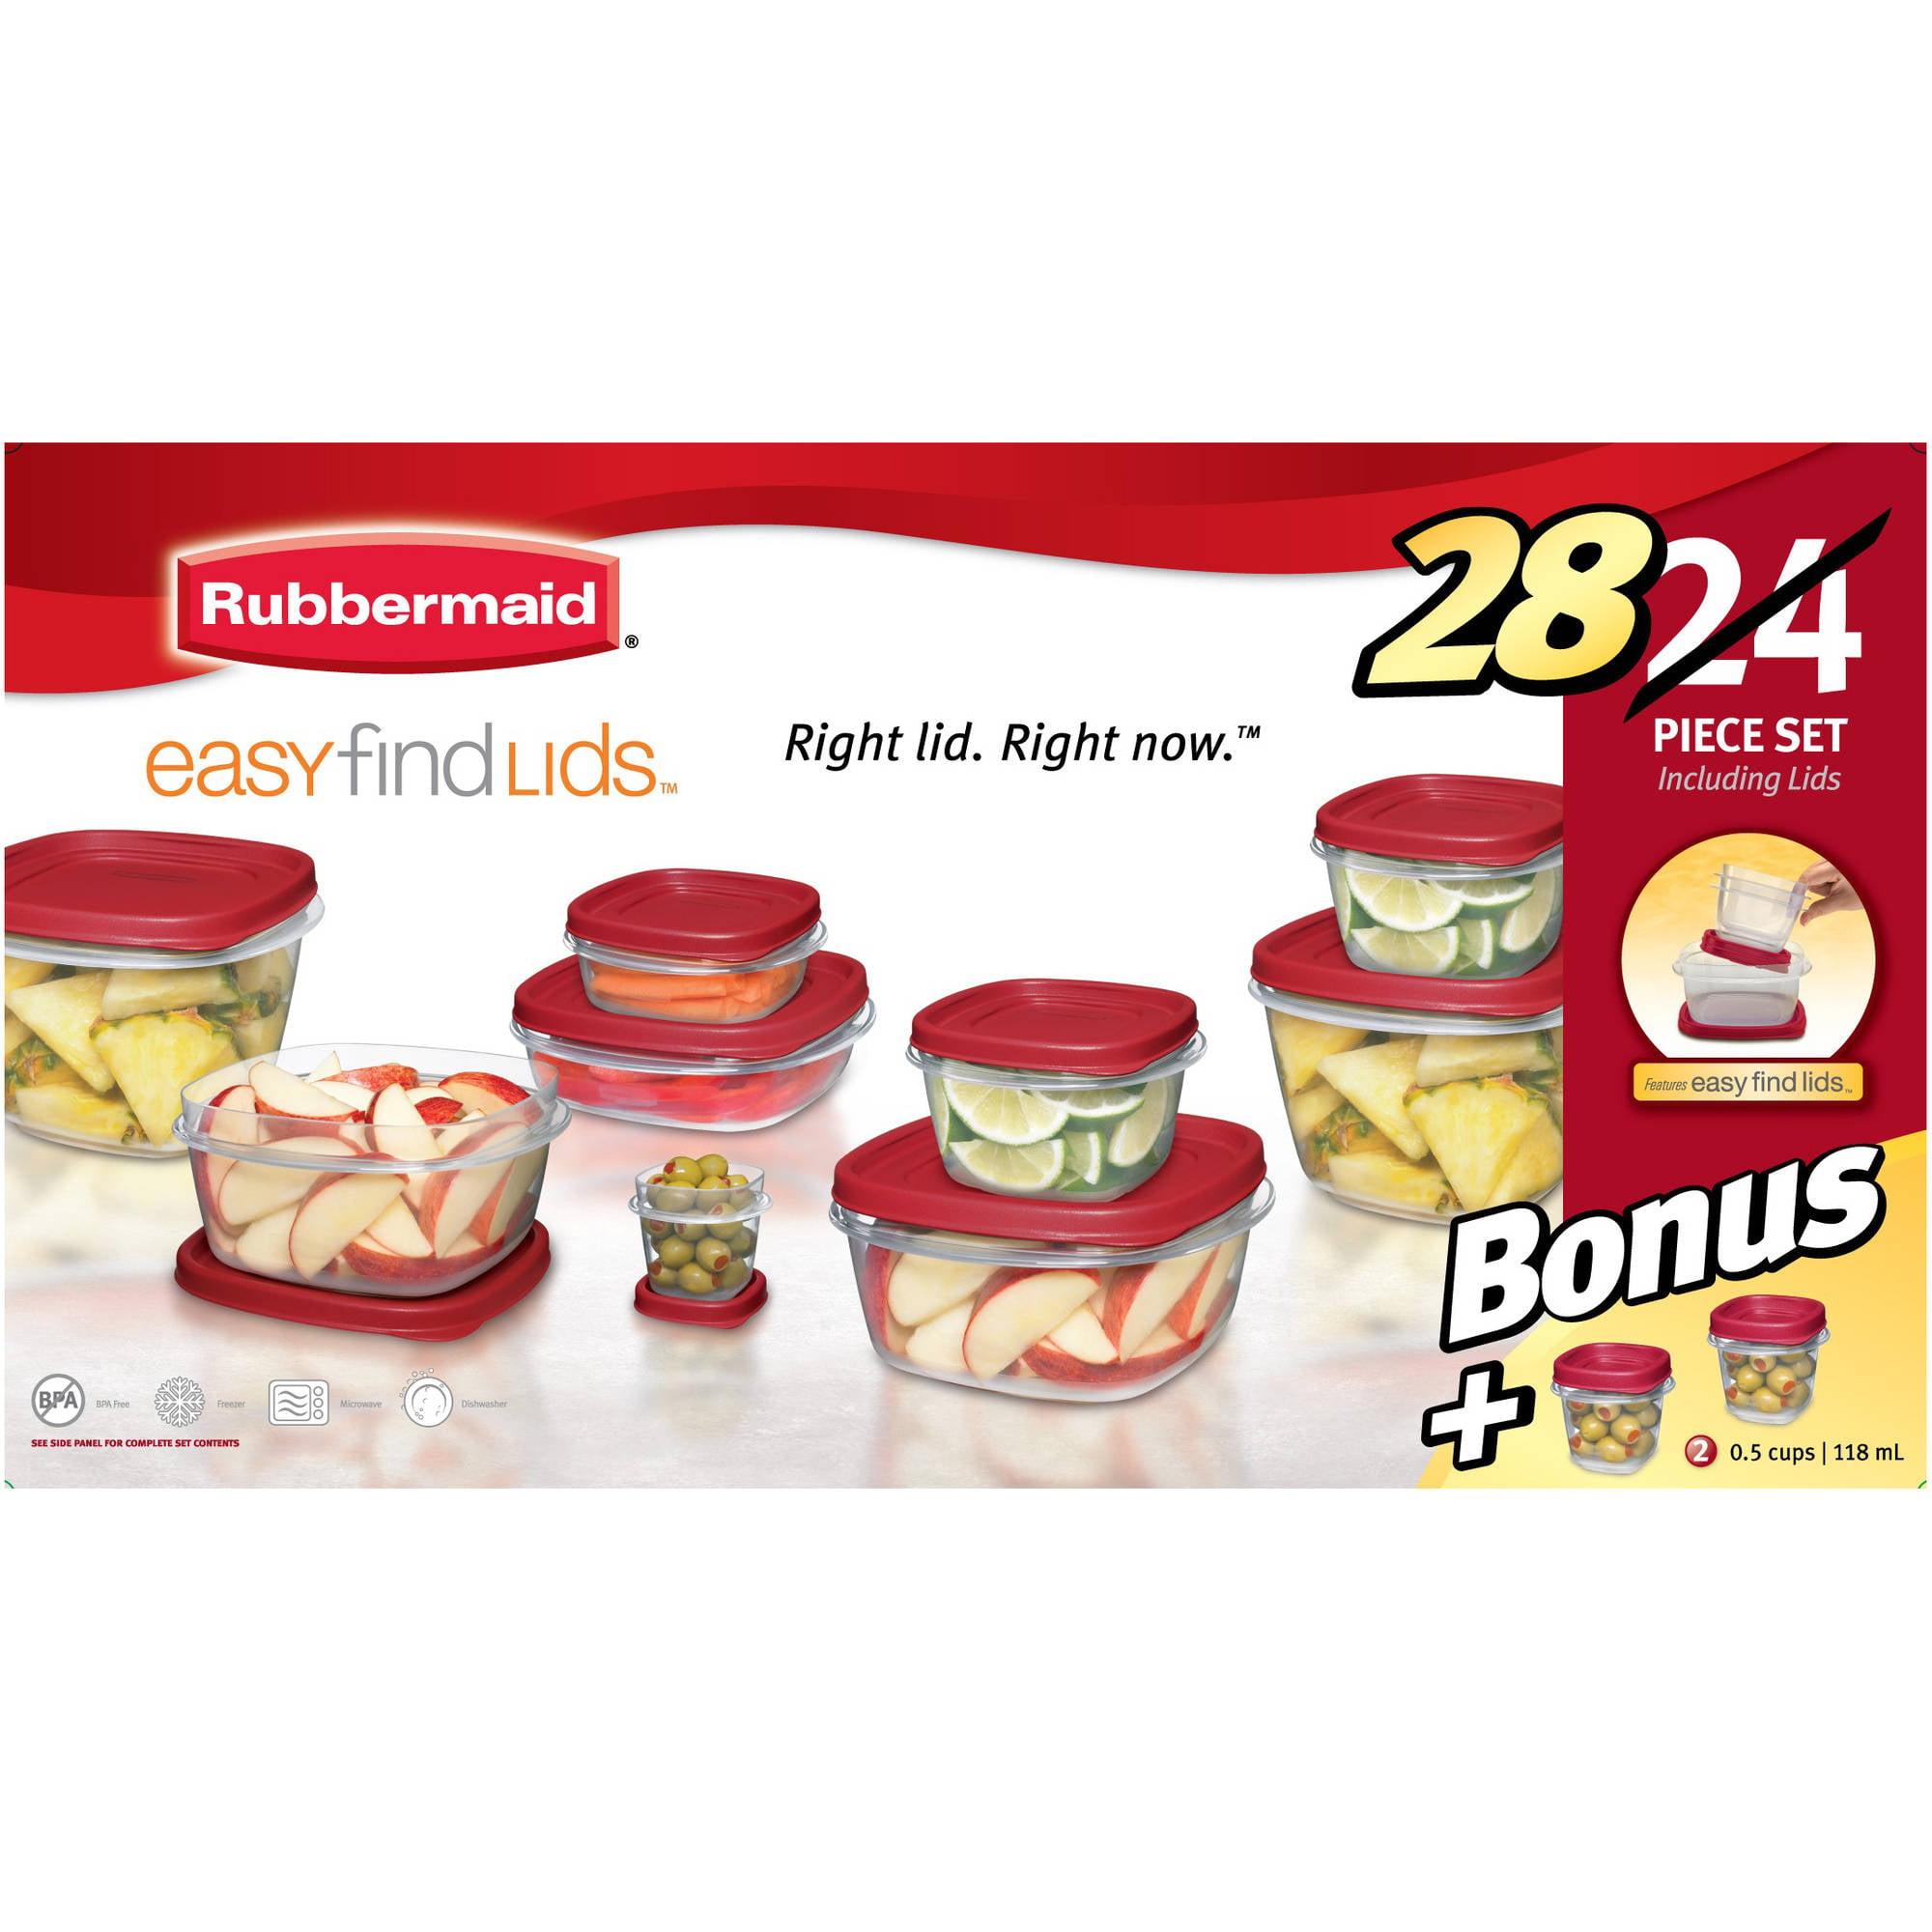 Rubbermaid Easy Find Lids 24-Piece Plus 4 Food Storage Set